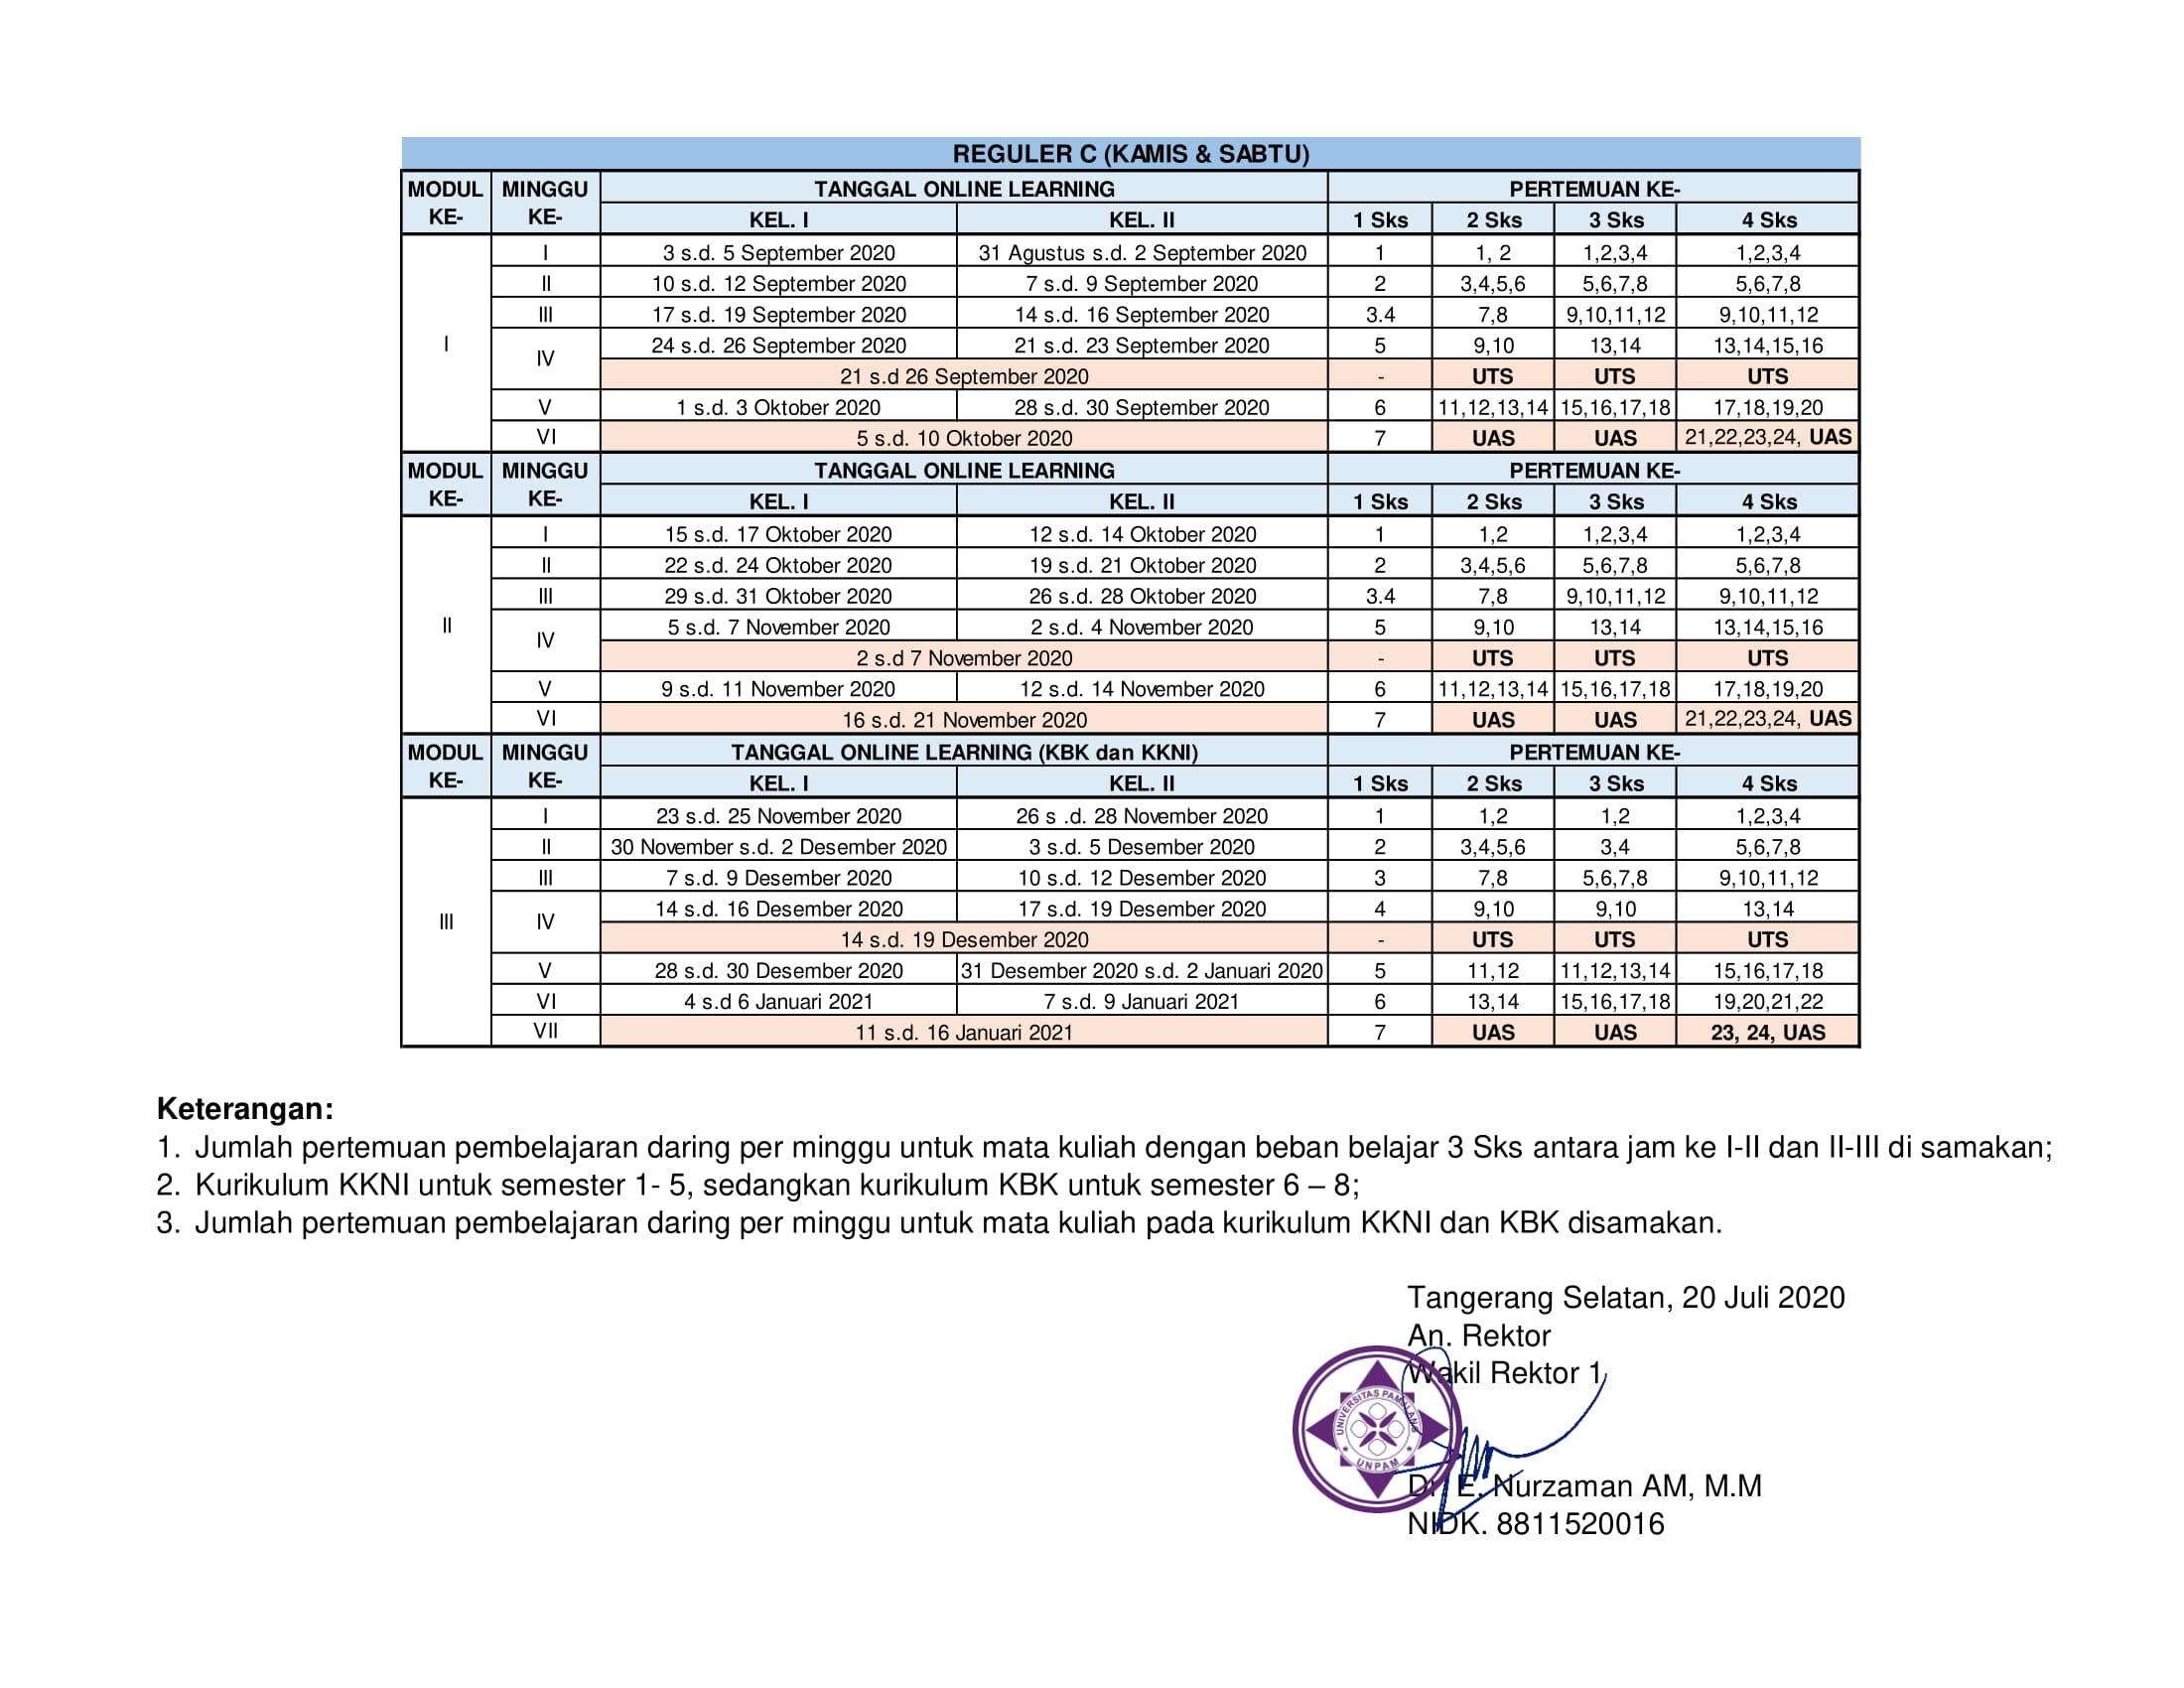 kalender-akademik-gasal-2020-2021-lengkap-3